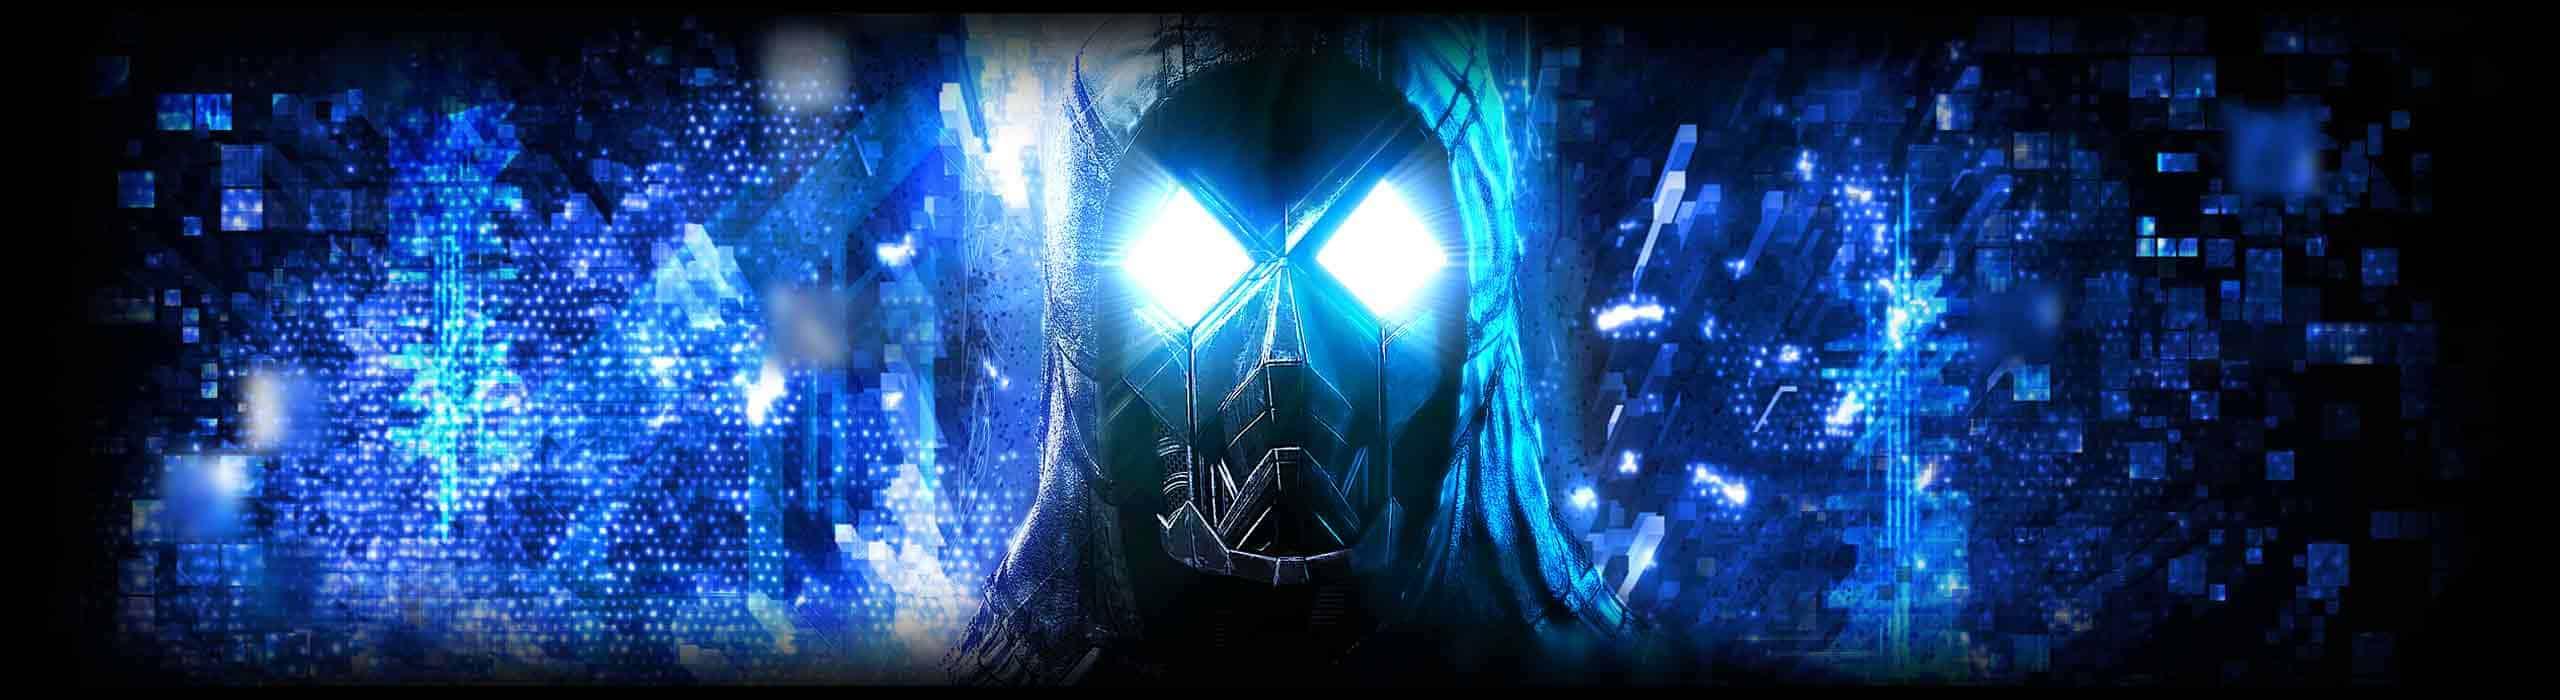 Talos Cyberpunk Web Comic